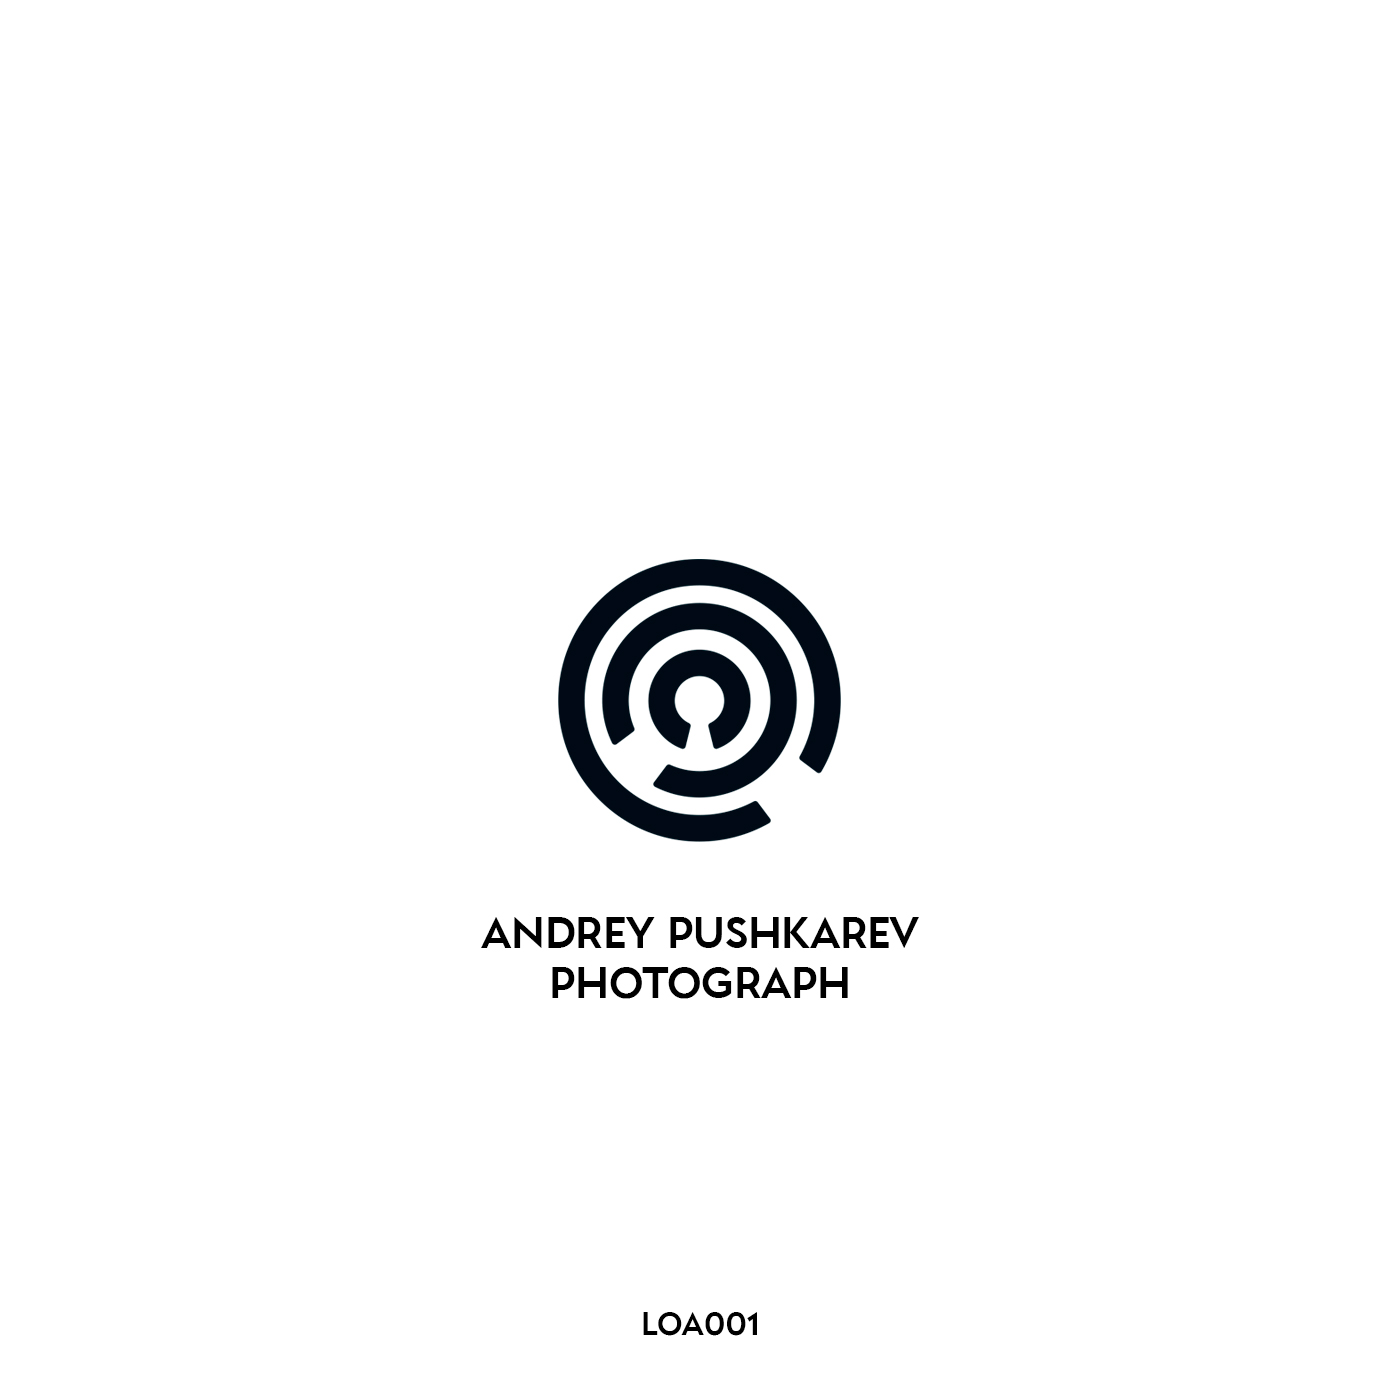 Andrey Pushkarev - Photograph Image